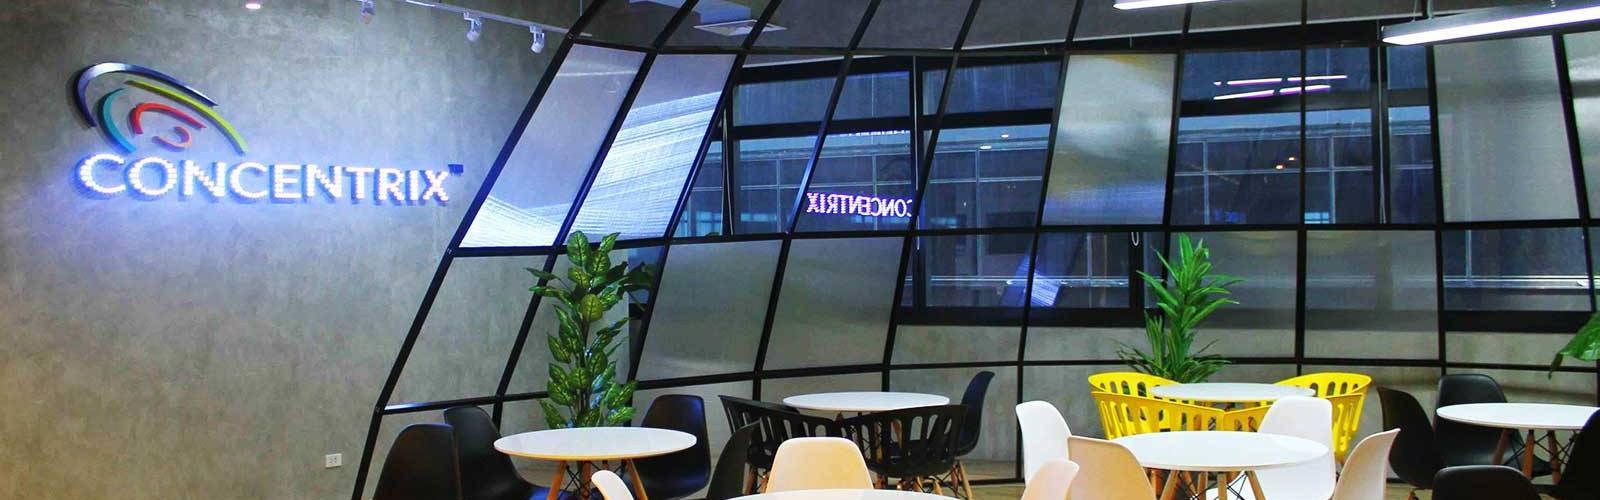 Concentrix Philippines opens its newest site - Slvrdlphn's